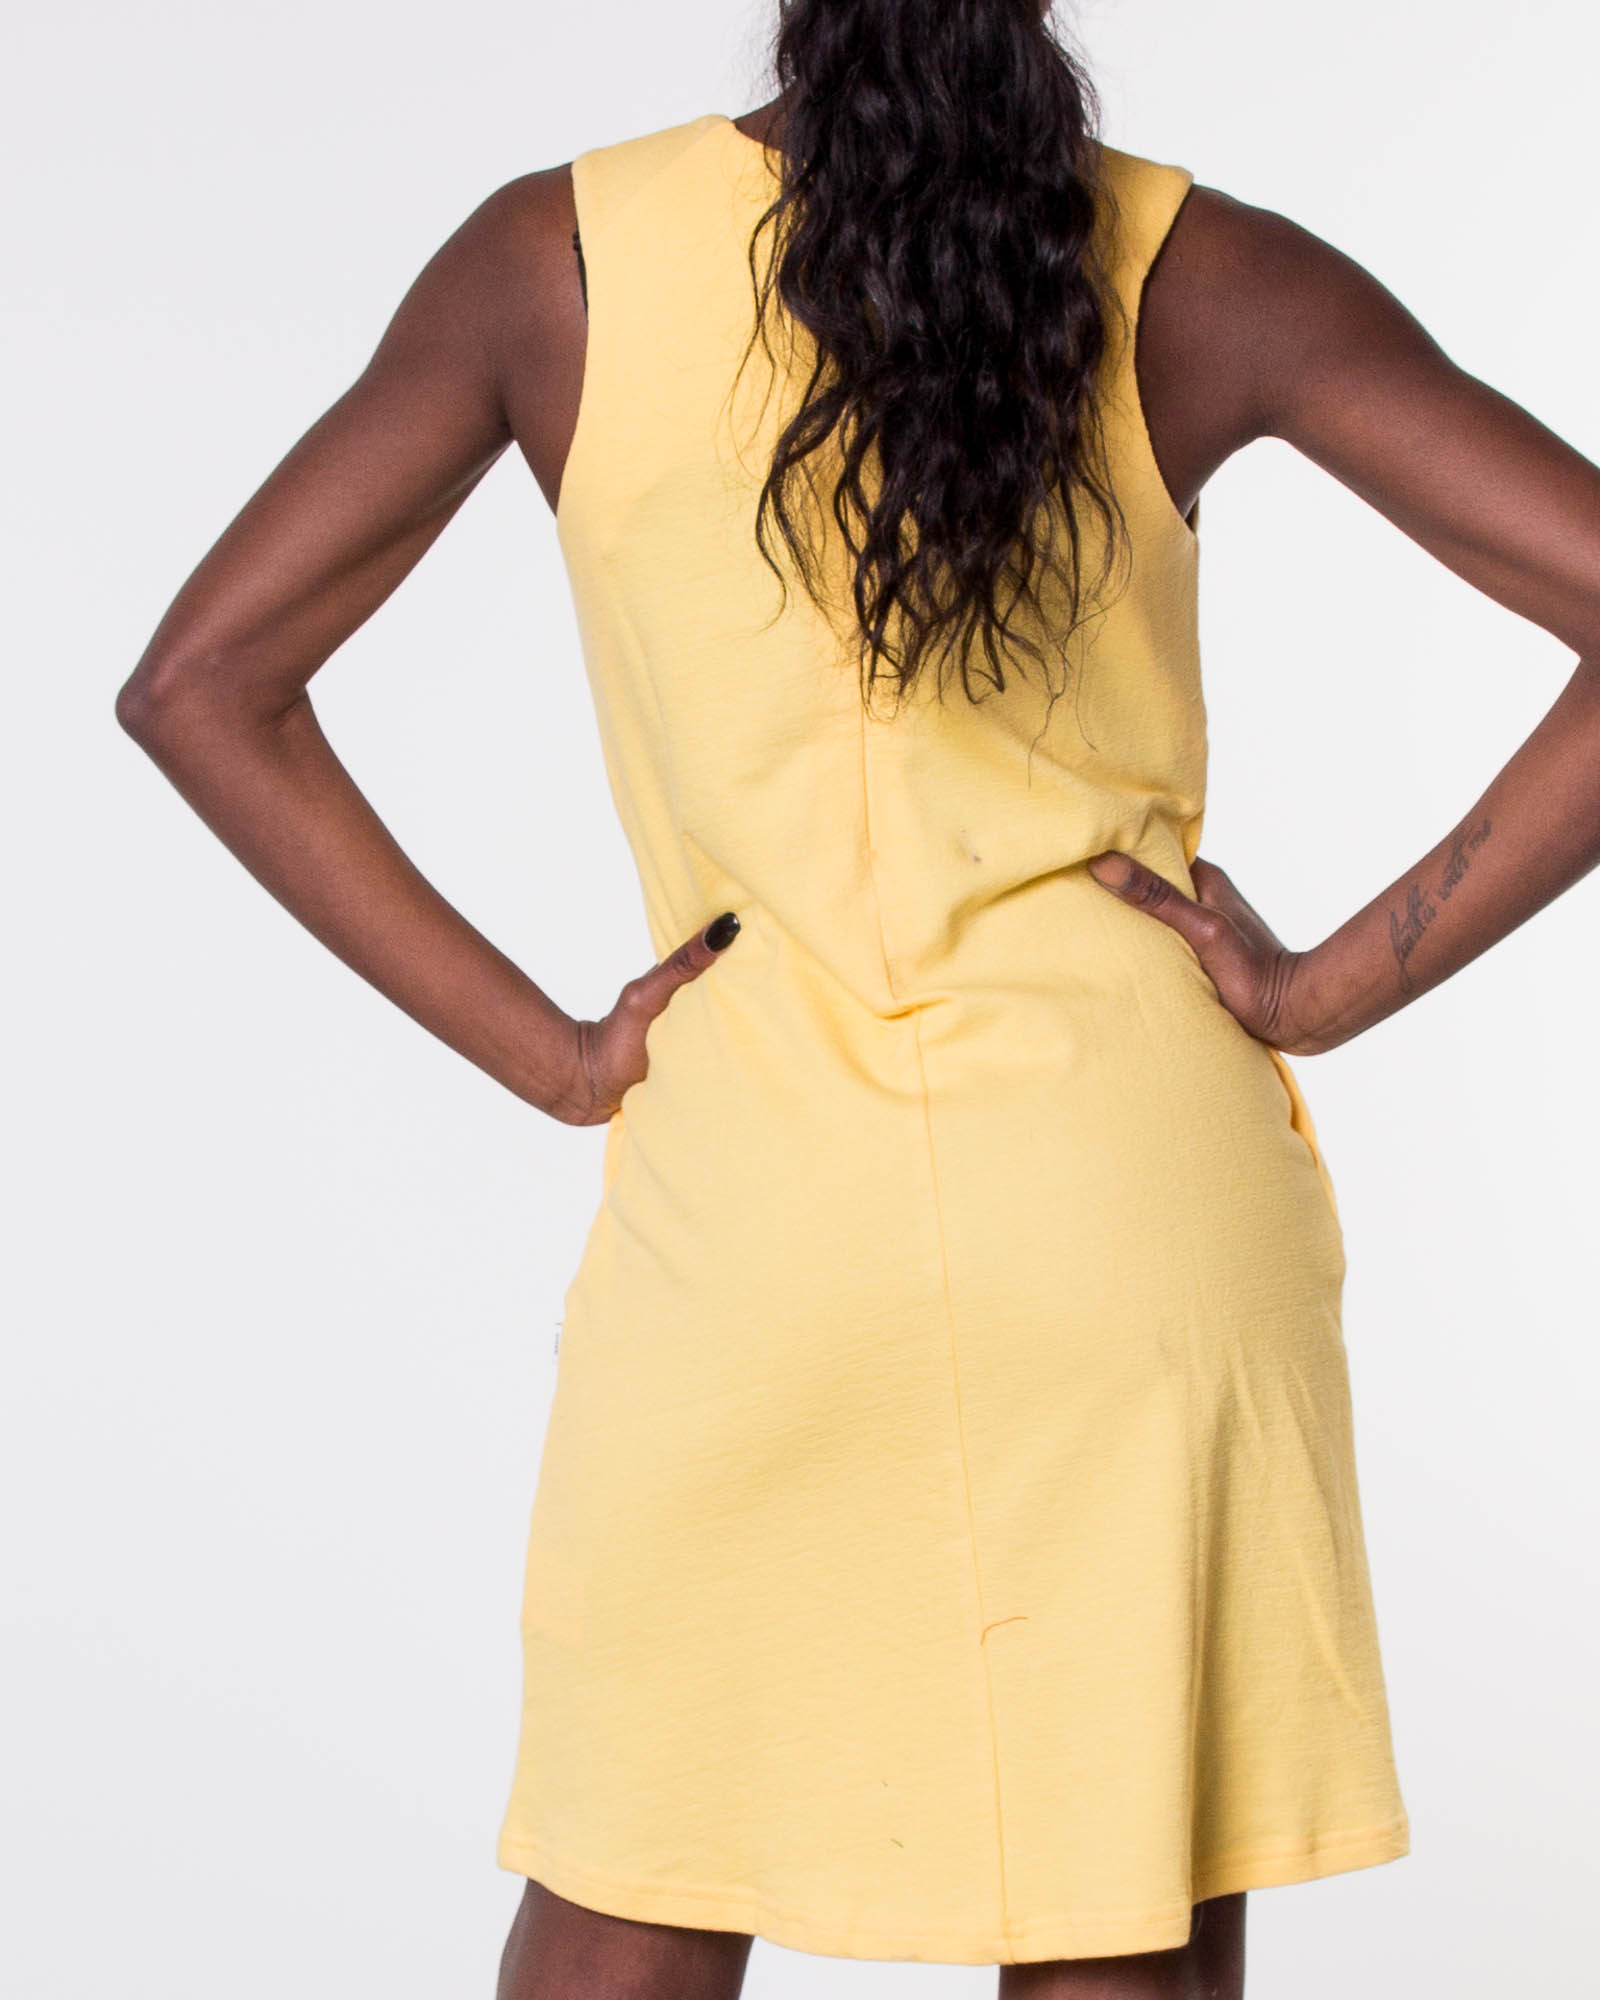 YellowAle com MakiaLuna Houseofbrandon Dress Mekot 4L5Rq3Aj